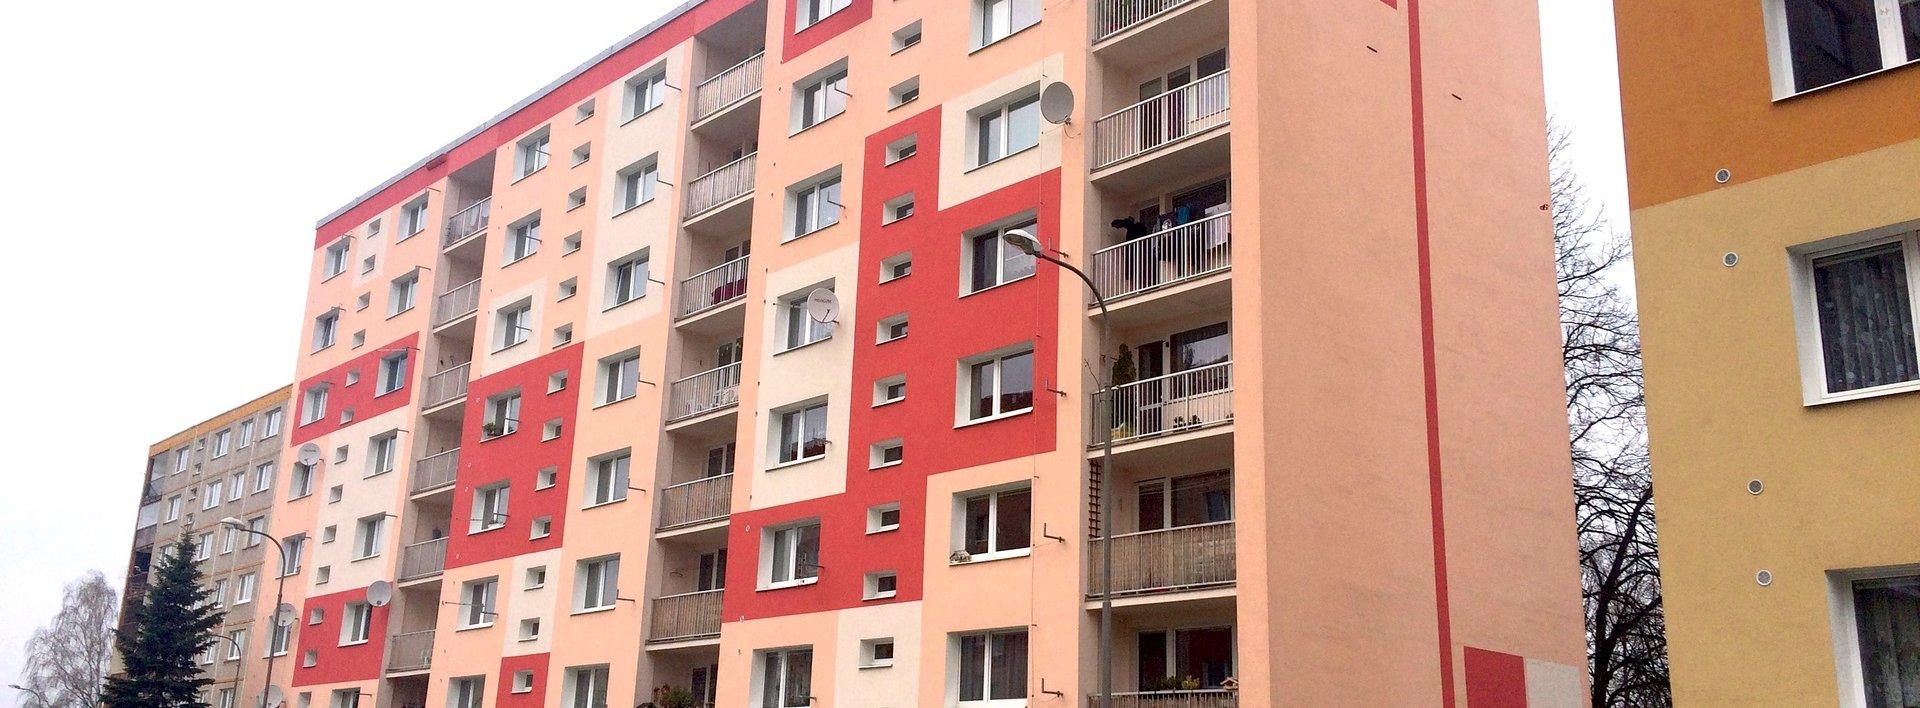 Pronájem bytu 2+kk, 42m² - Liberec - Vesec, Ev.č.: N48046